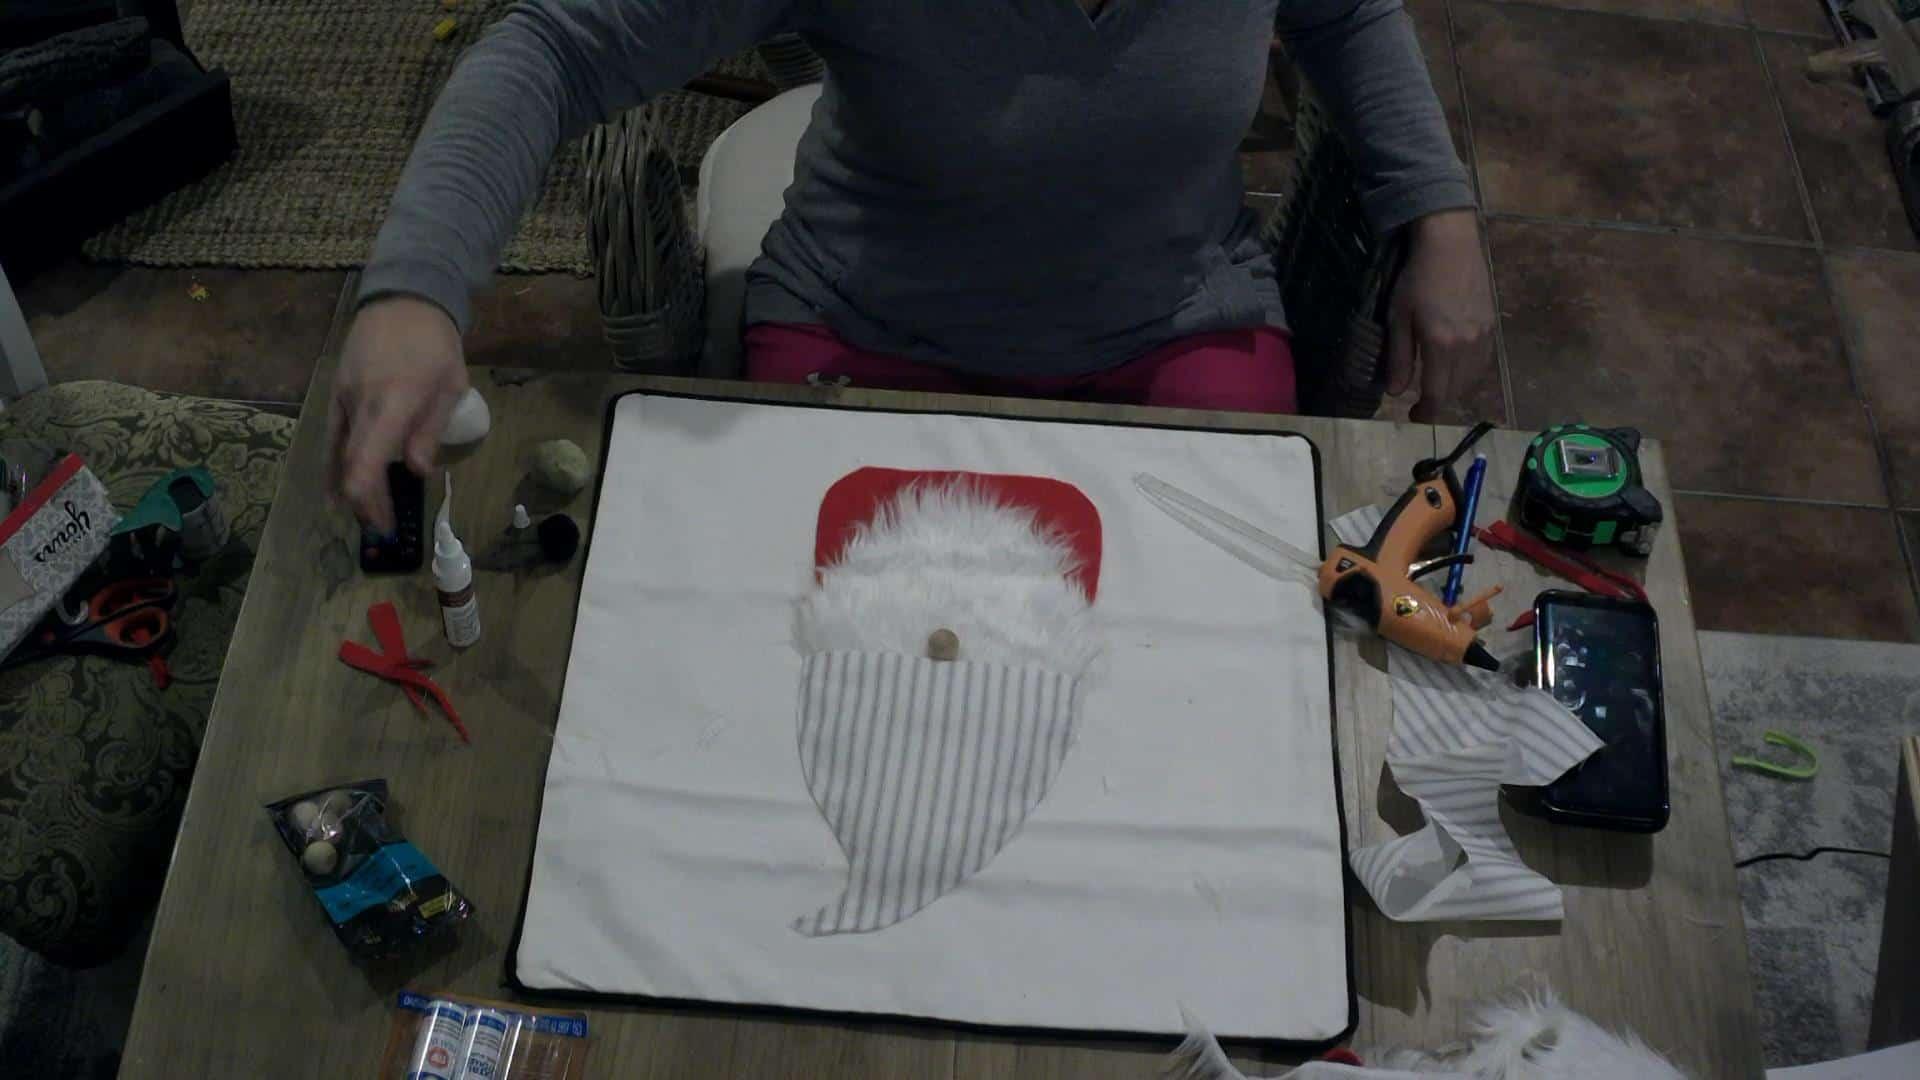 DIY Gnome Pillow Cover - adding the nose